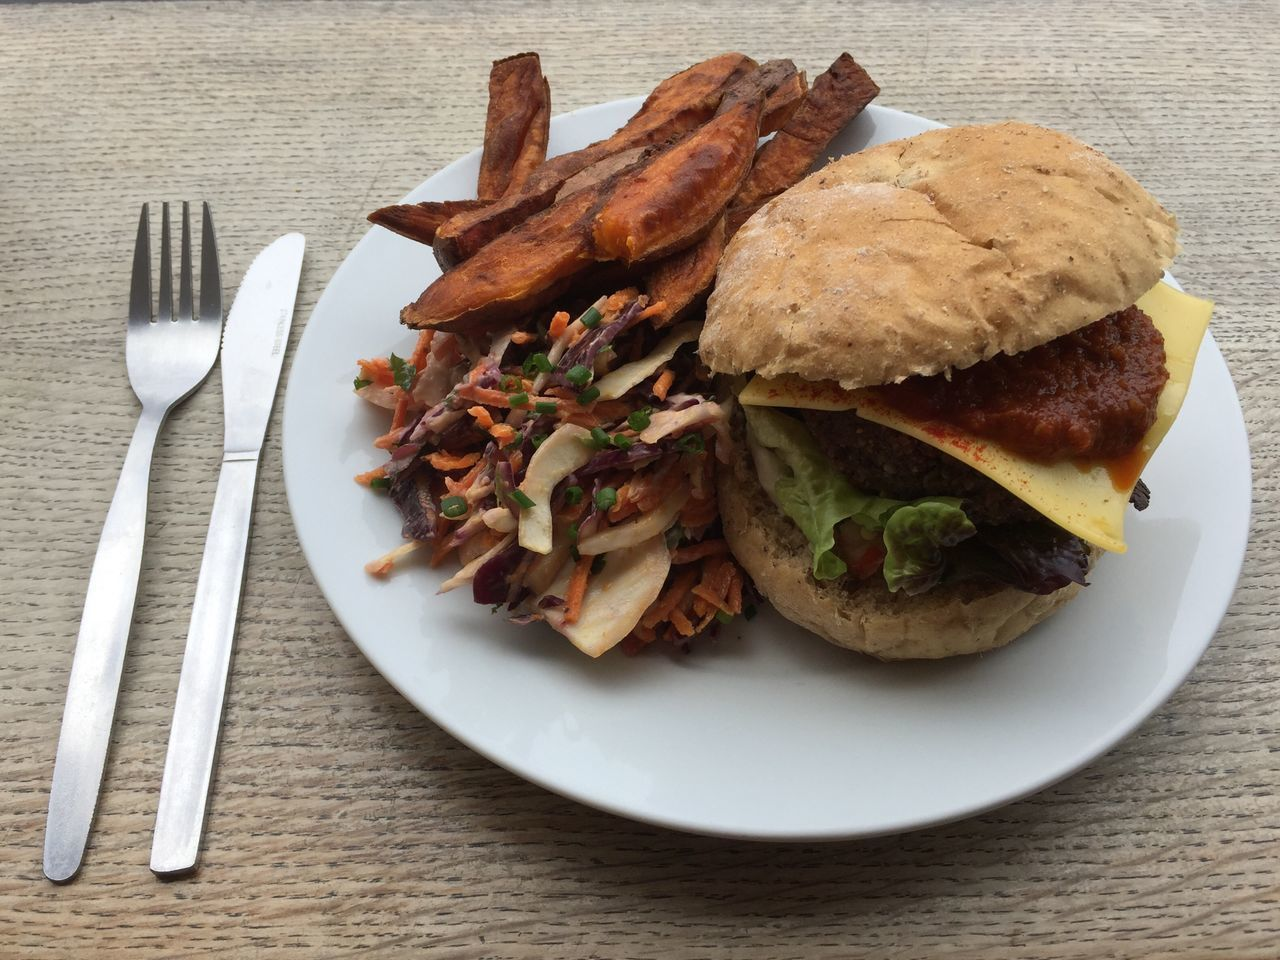 Close-up Food Freshness Indulgence Meal No People Plate Ready-to-eat Served Serving Size Still Life Sweet Potatoes Temptation Vegan Vegetarian Vegetarian Food